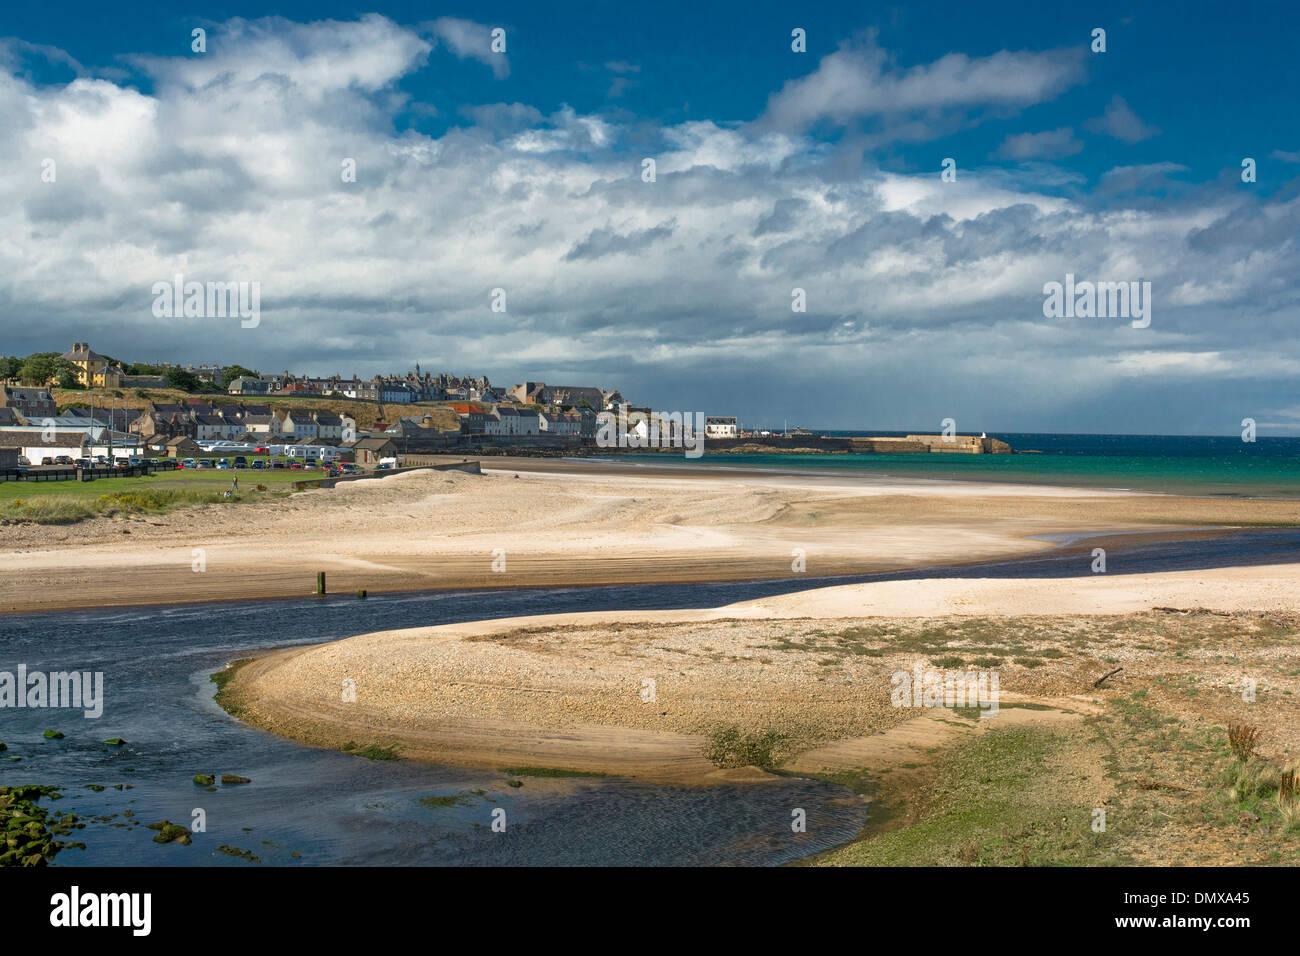 banff sands beach bridge moray estuary river - Stock Image